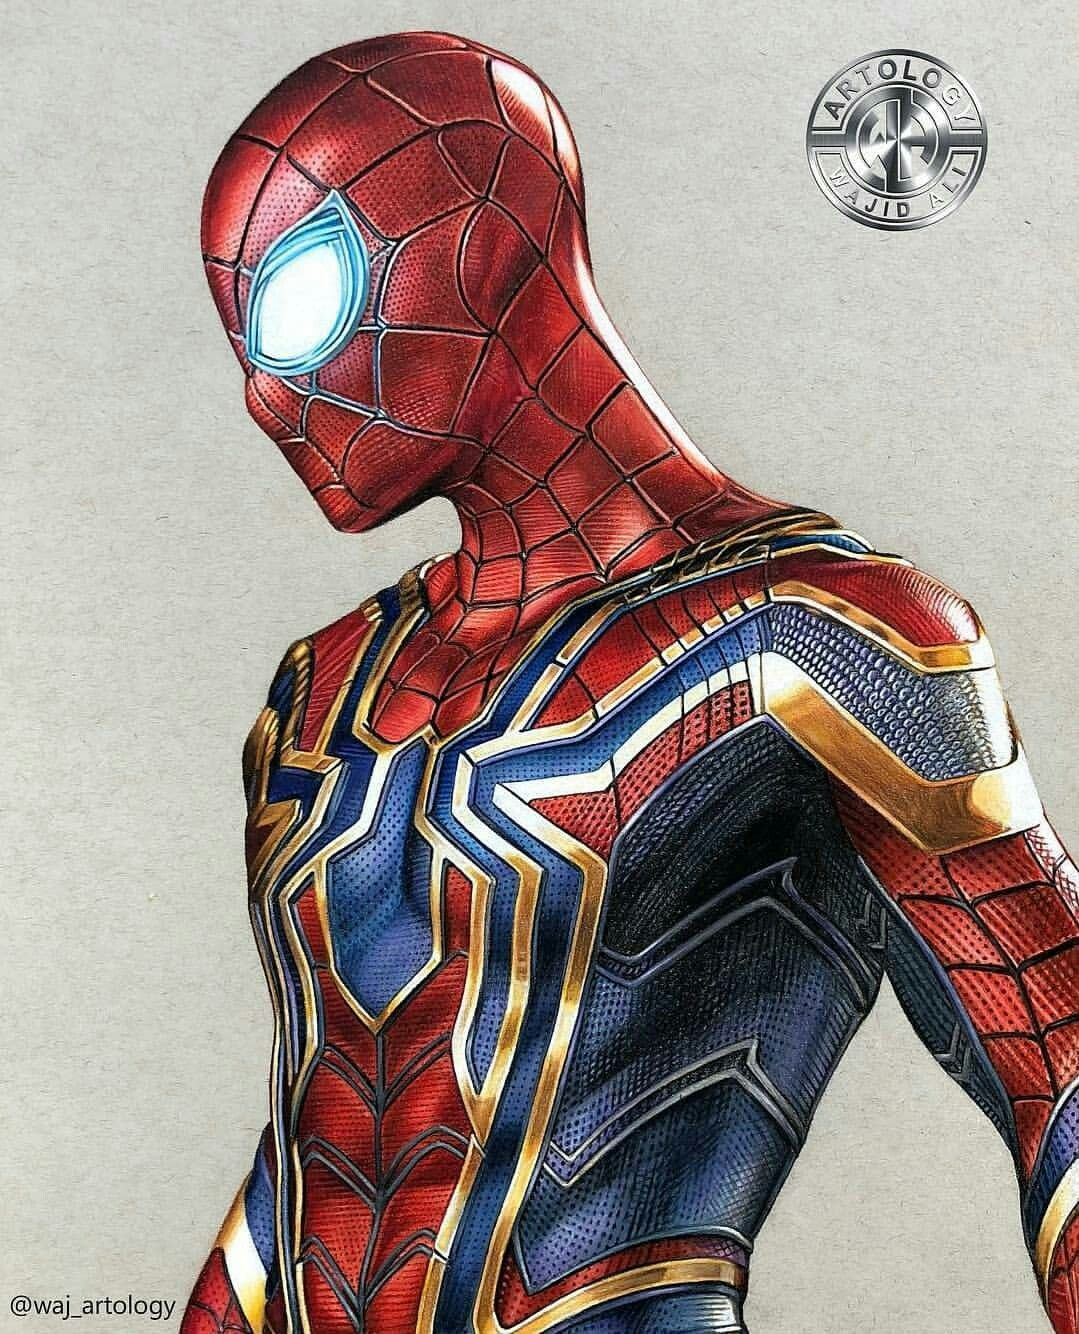 Spidey Hombre Arana Comic Superheroes Dibujos Superheroes Marvel